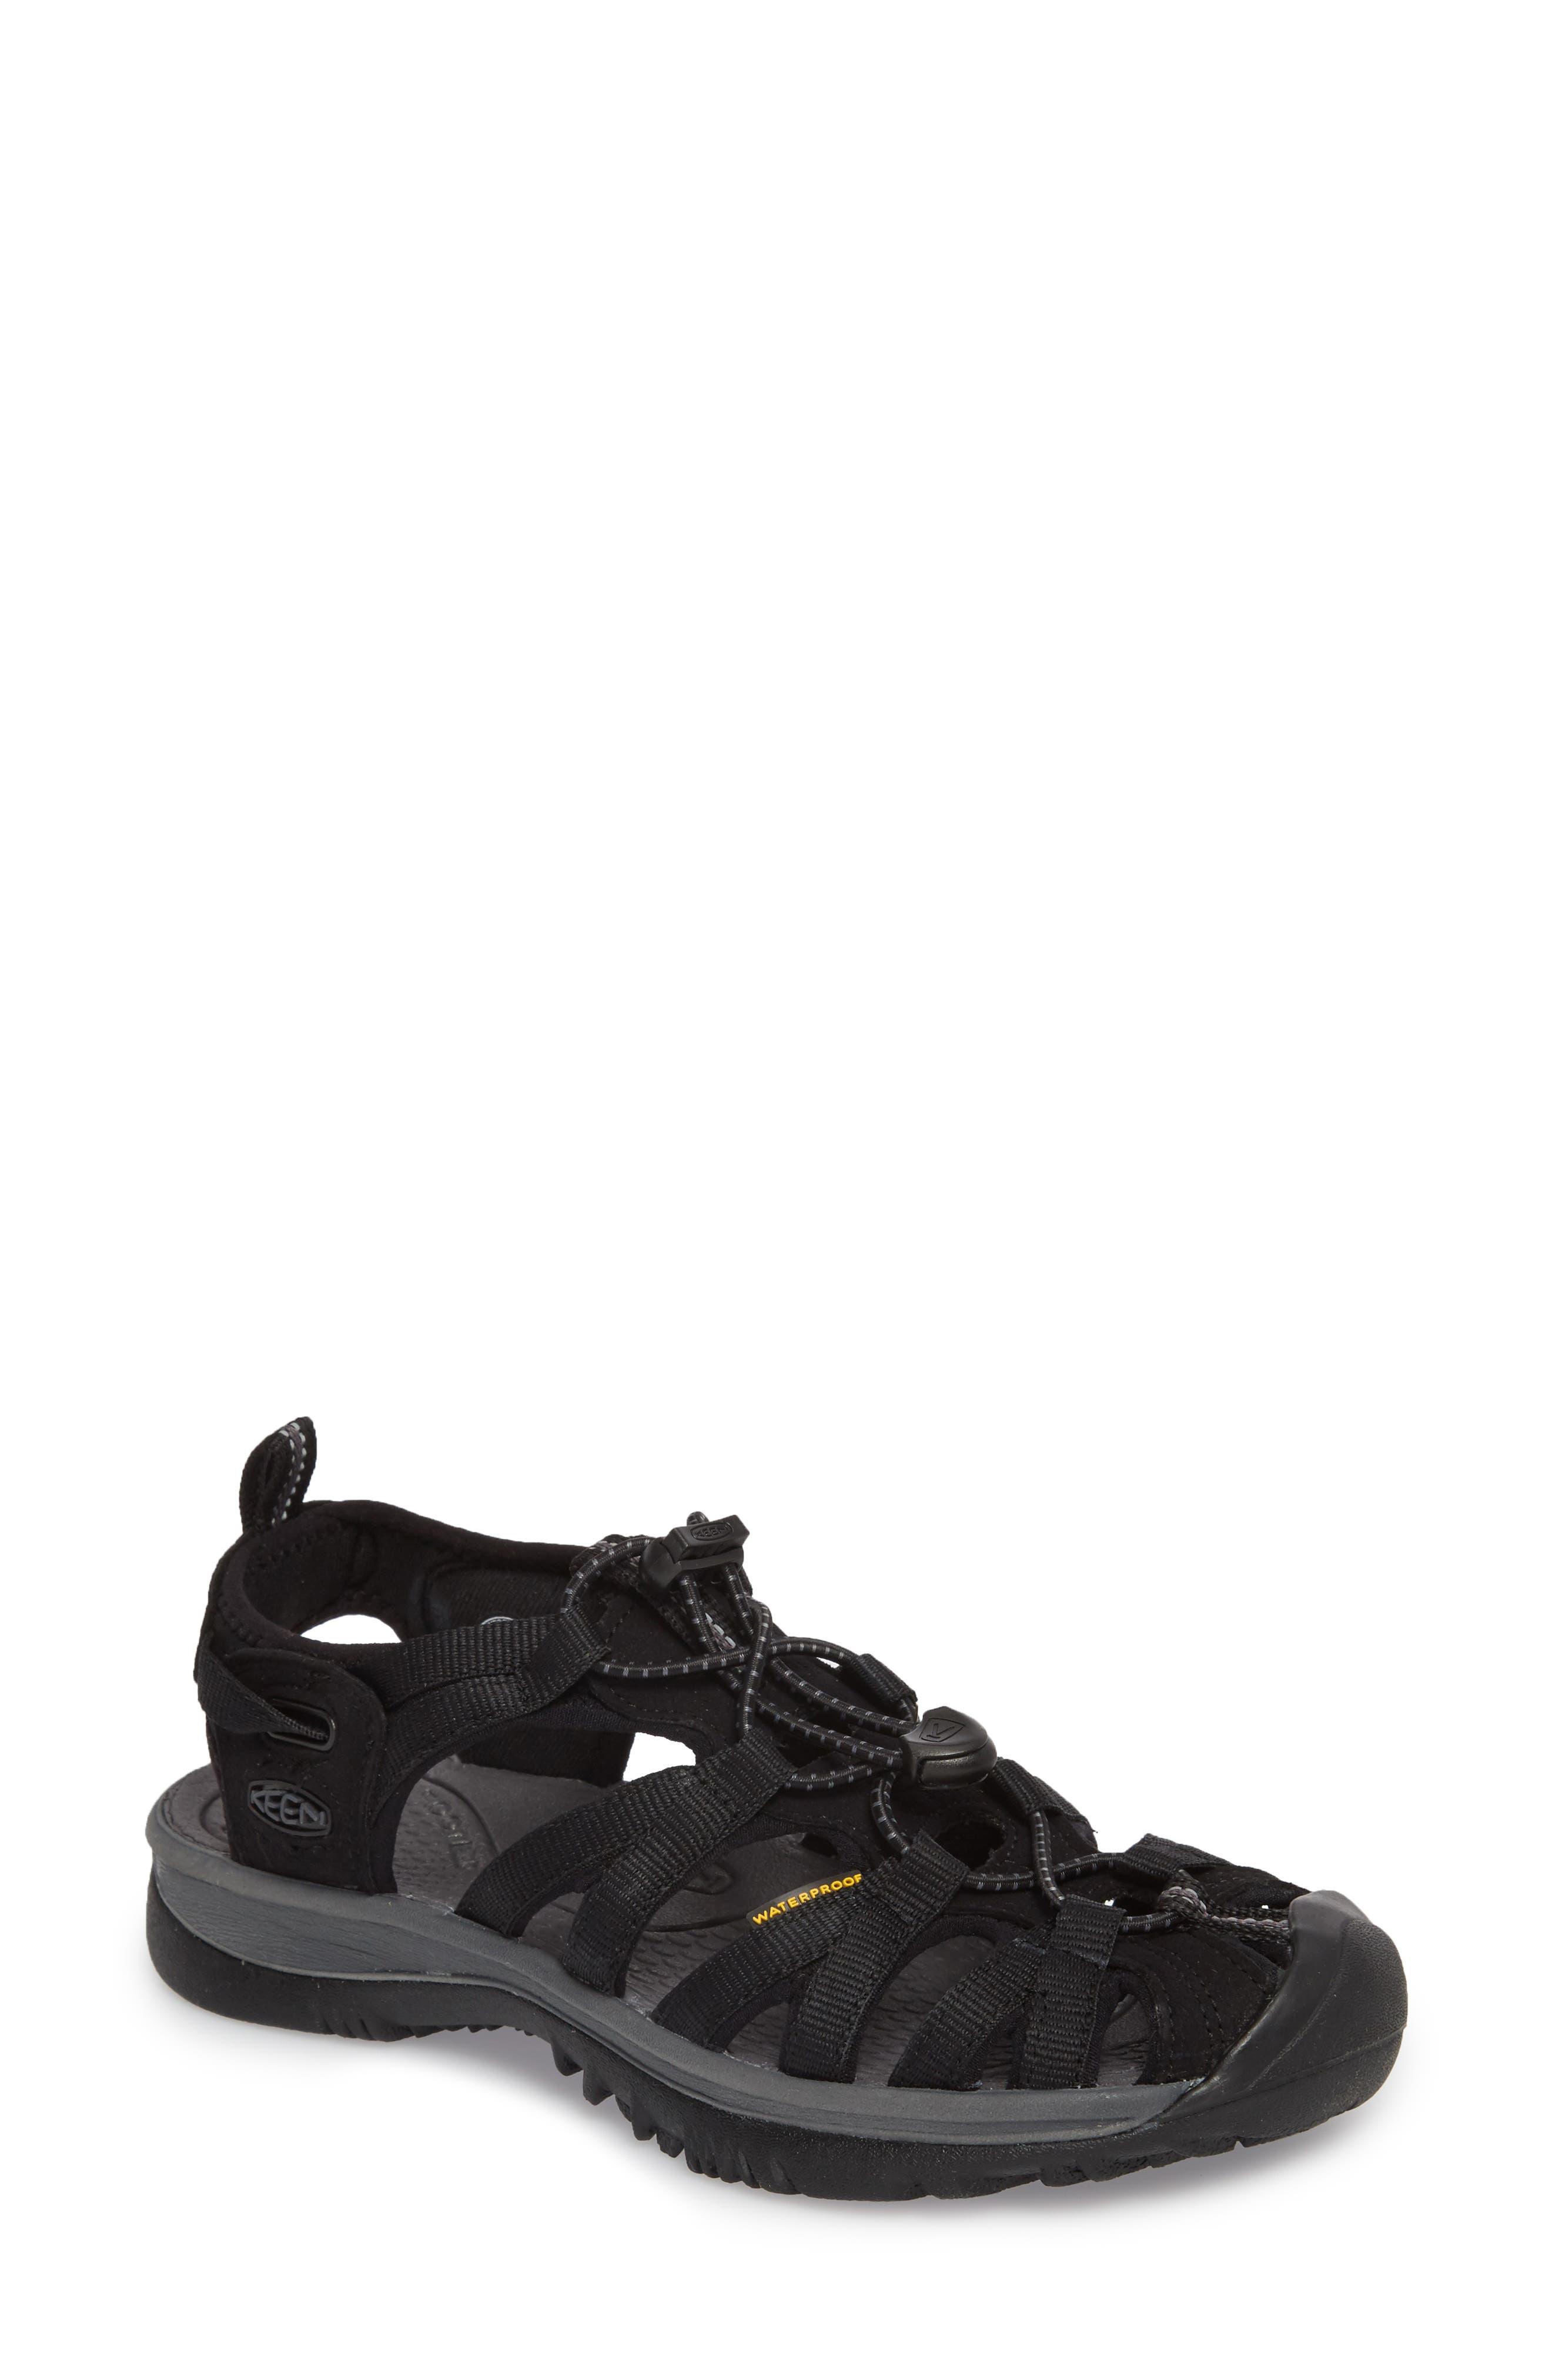 'Whisper' Water Friendly Sport Sandal,                             Main thumbnail 1, color,                             BLACK/ MAGNET